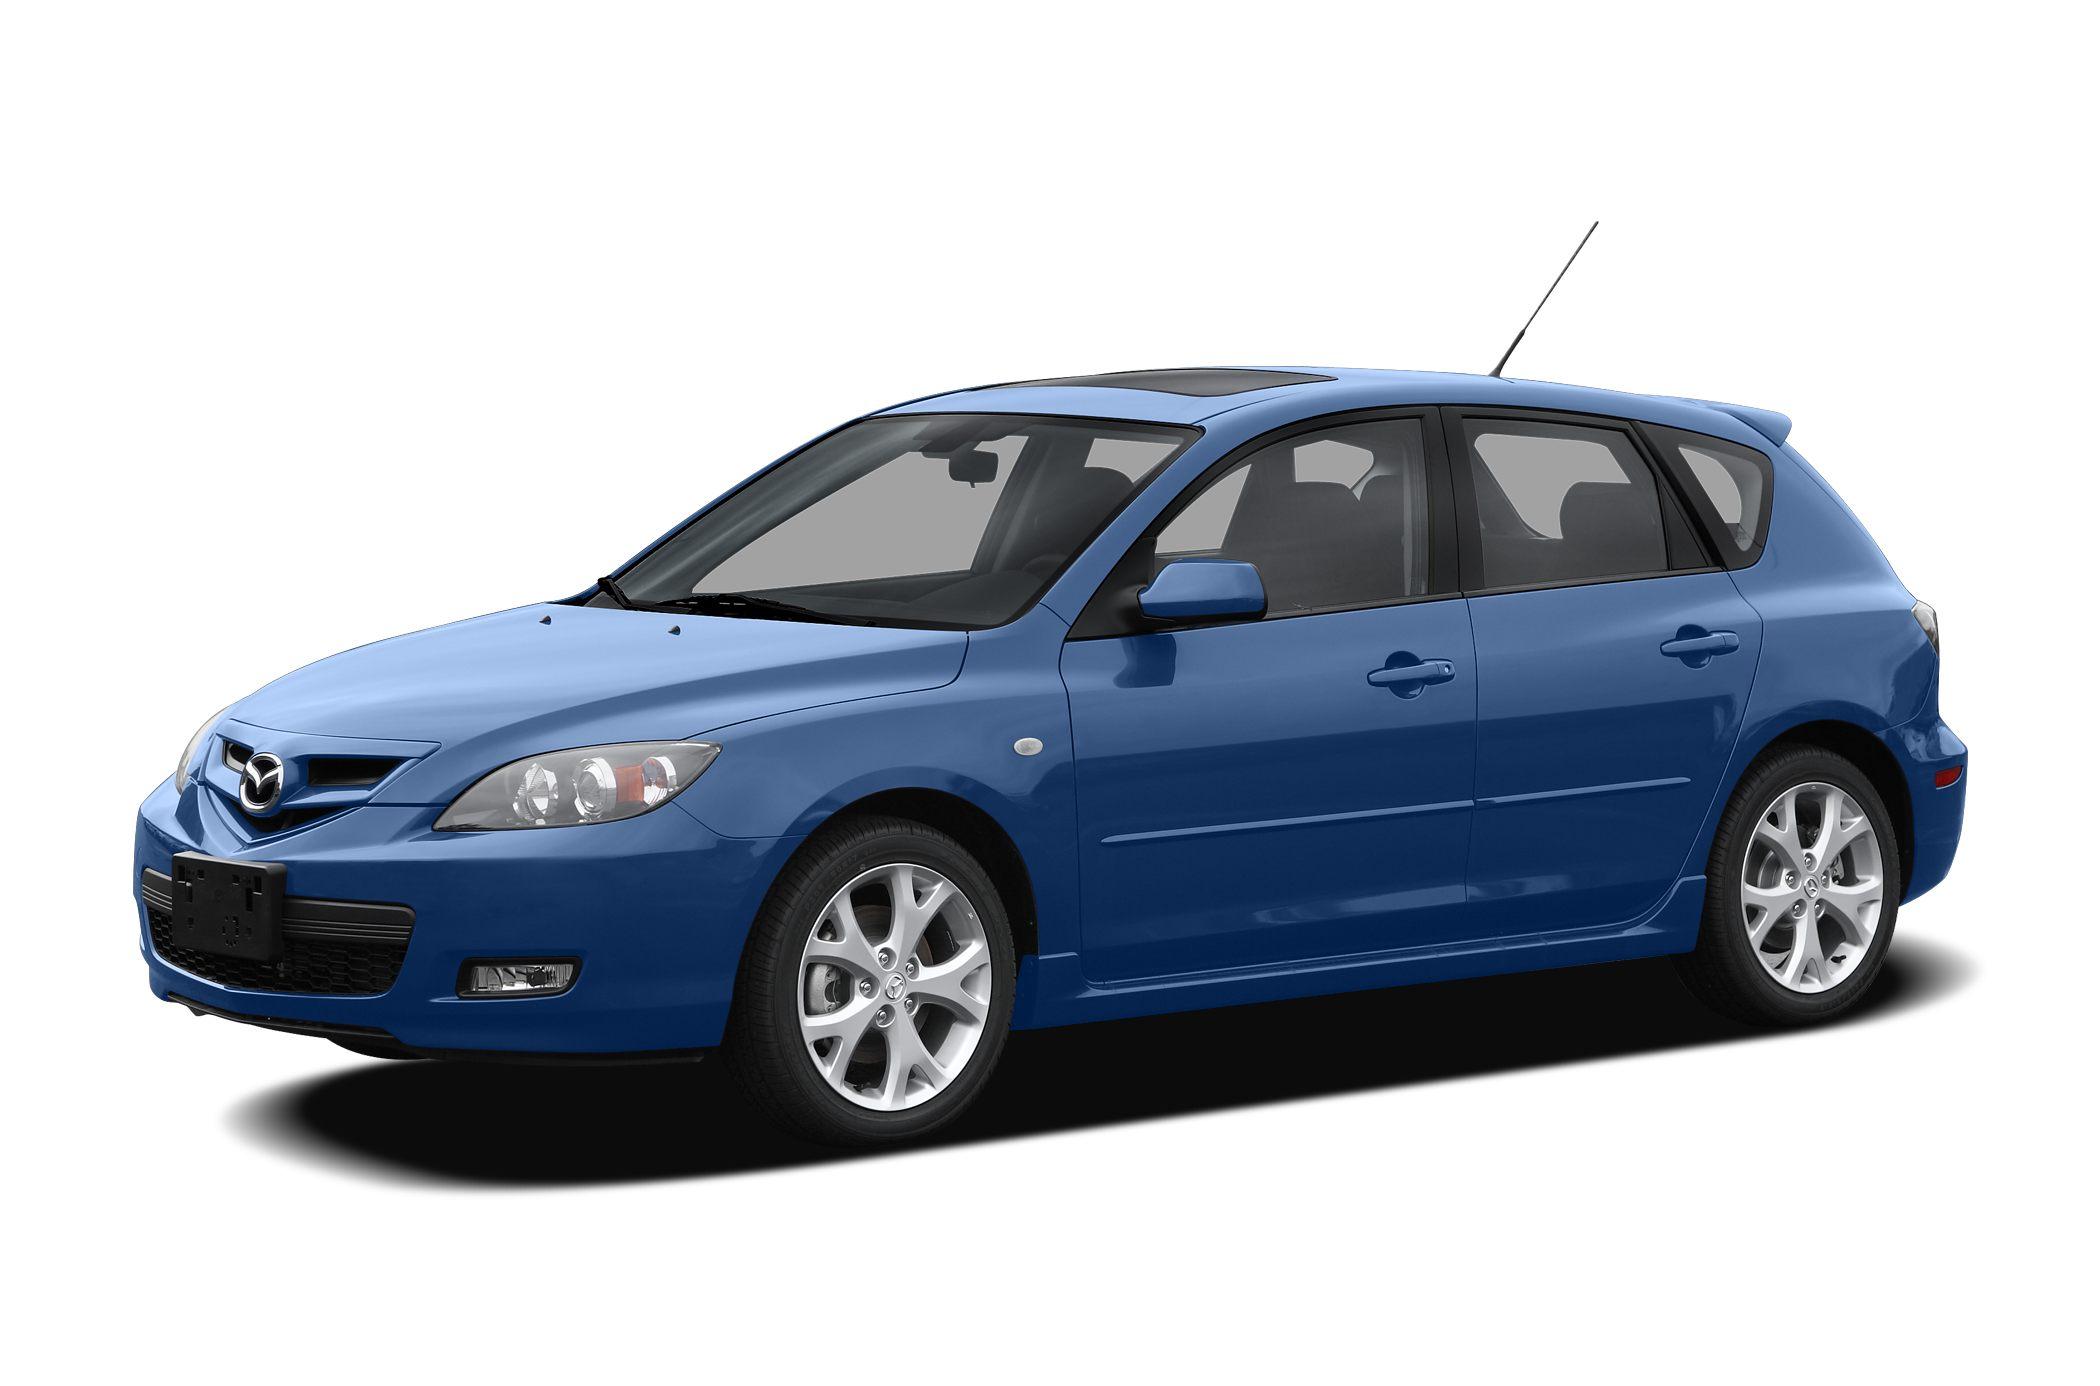 2008 Mazda Mazda3 s Sport 4dr Hatchback Specs and PricesAutoblog